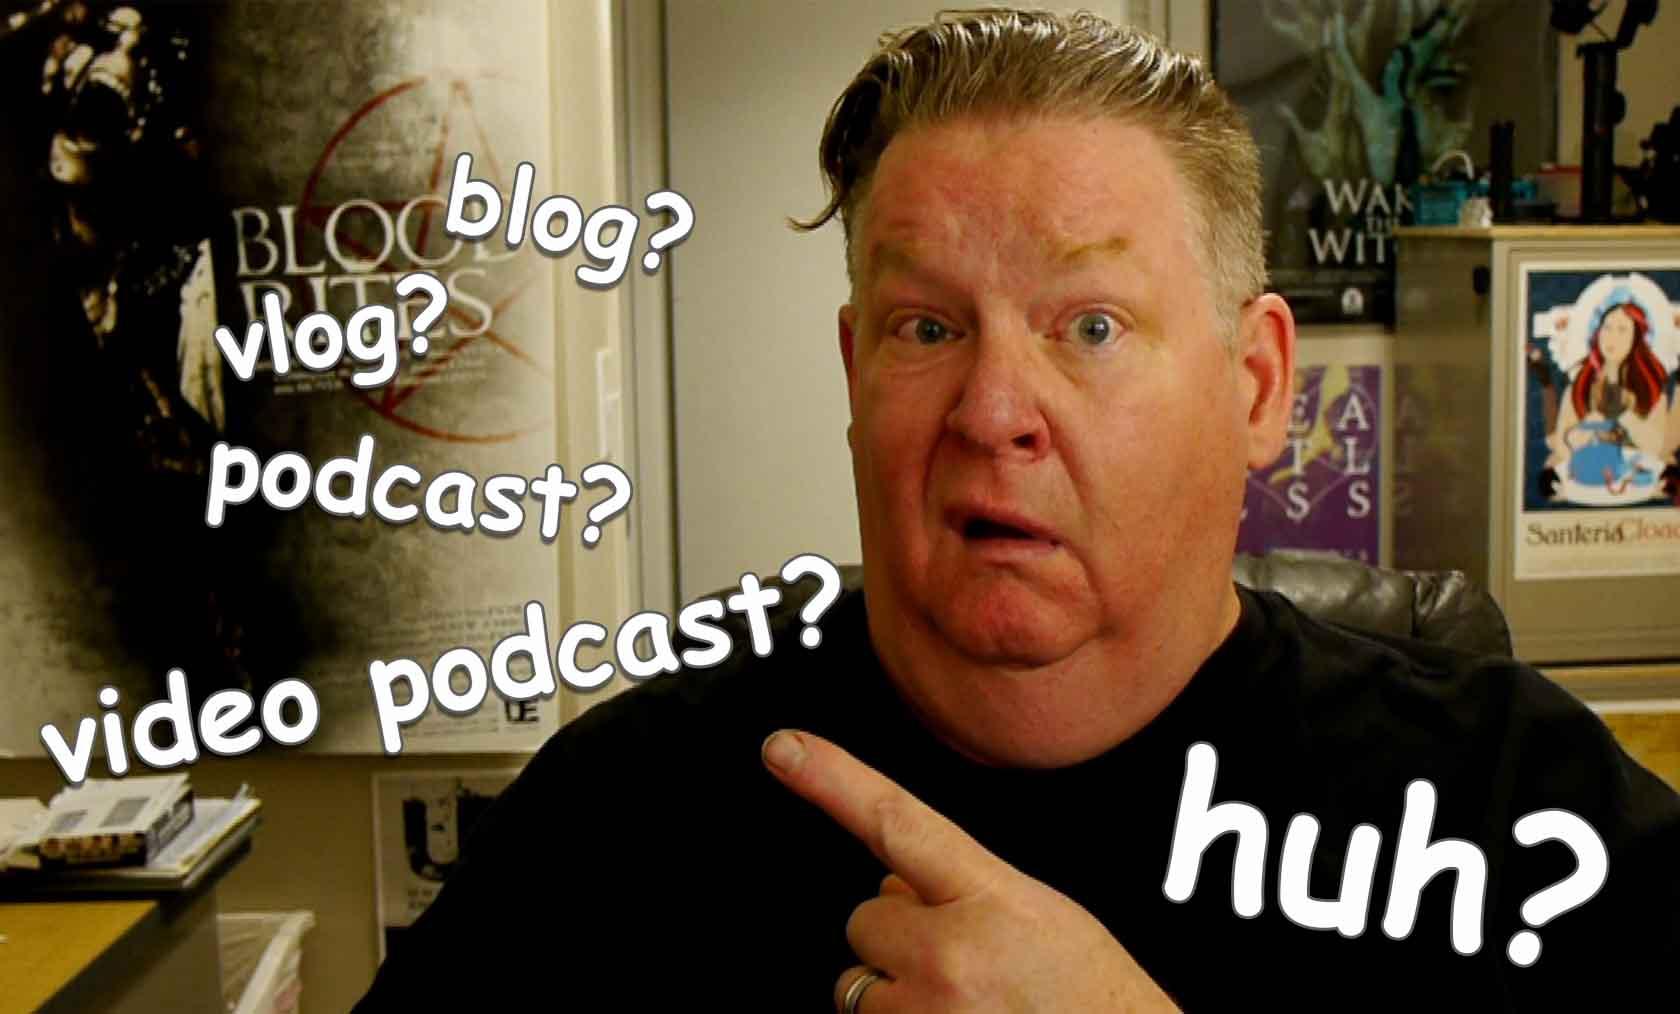 blog vlog huh featured